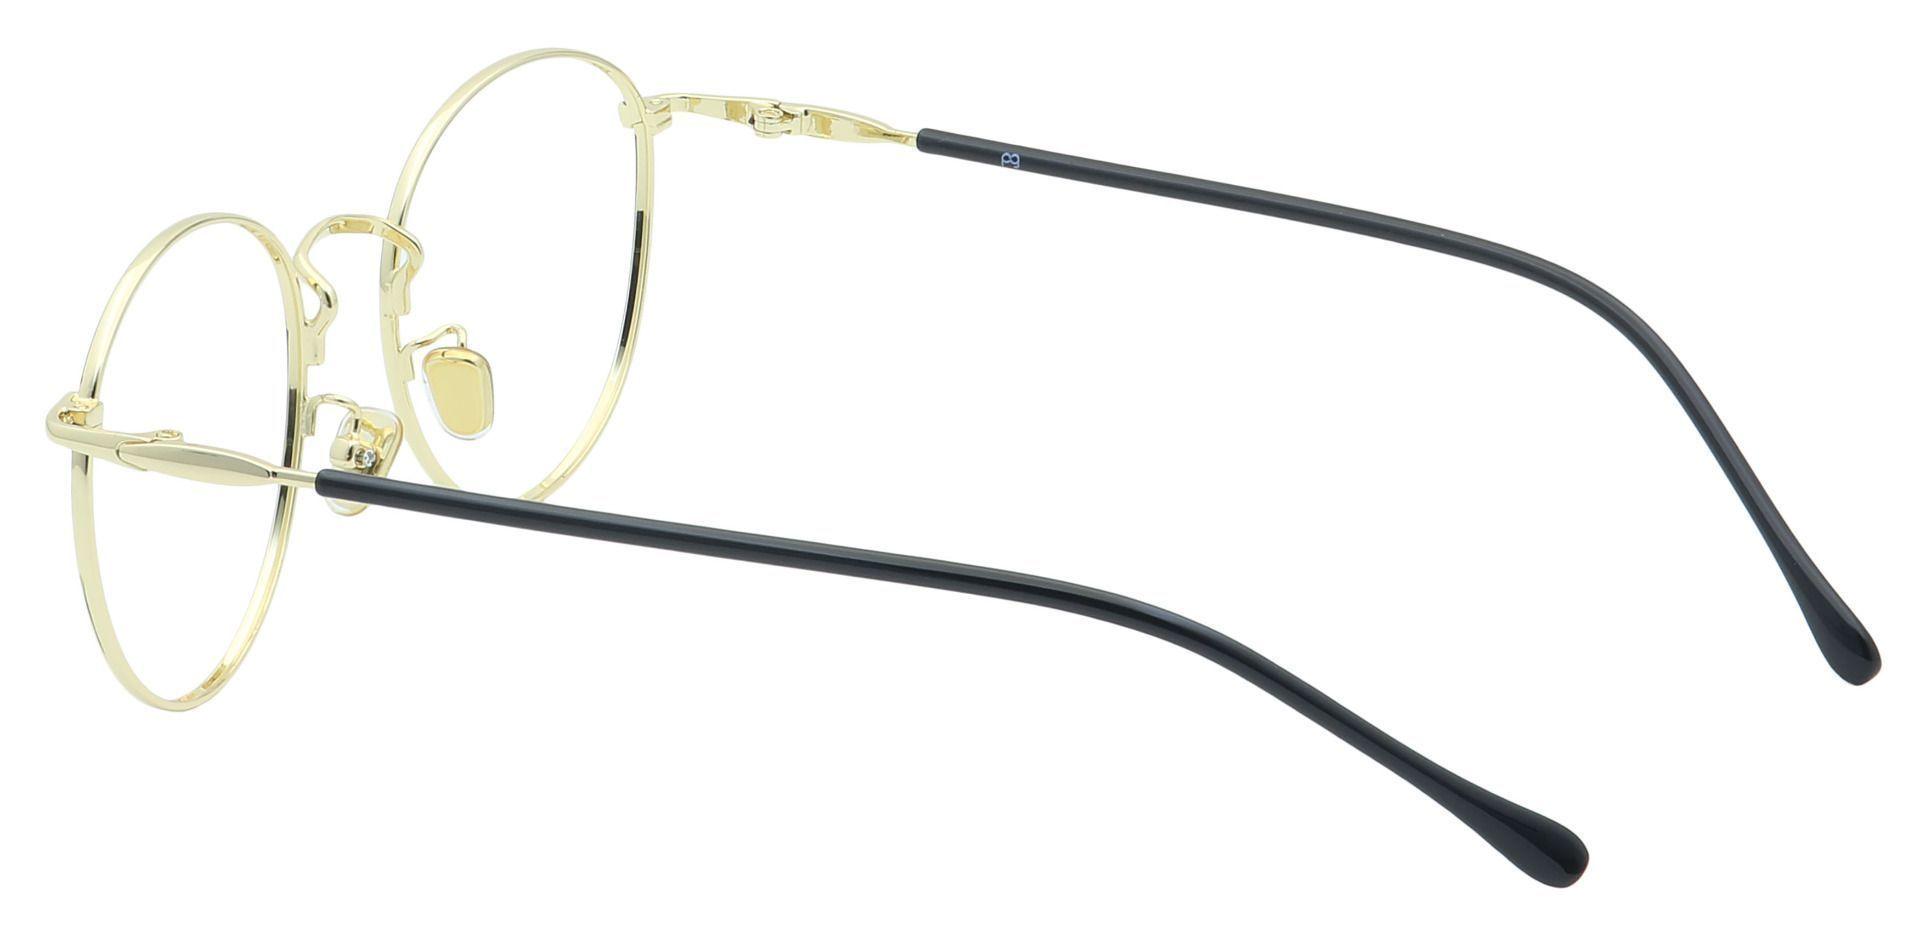 Metro Round Eyeglasses Frame - Black